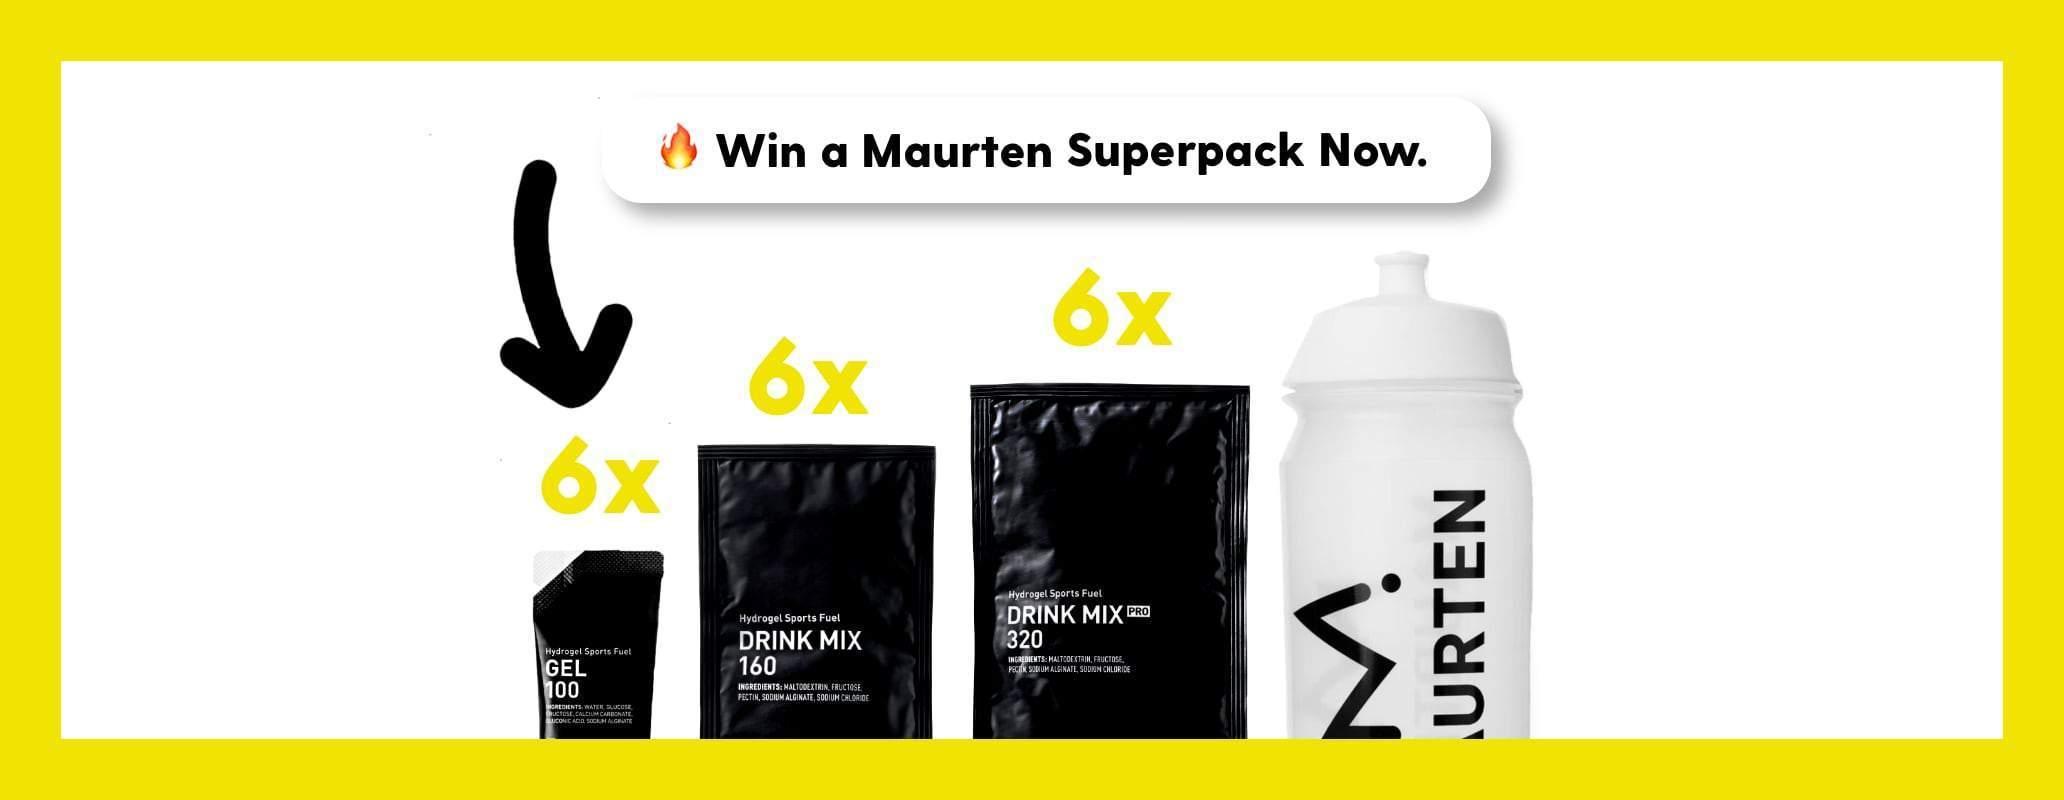 🔥Win 1 of 25 Maurten Superpacks